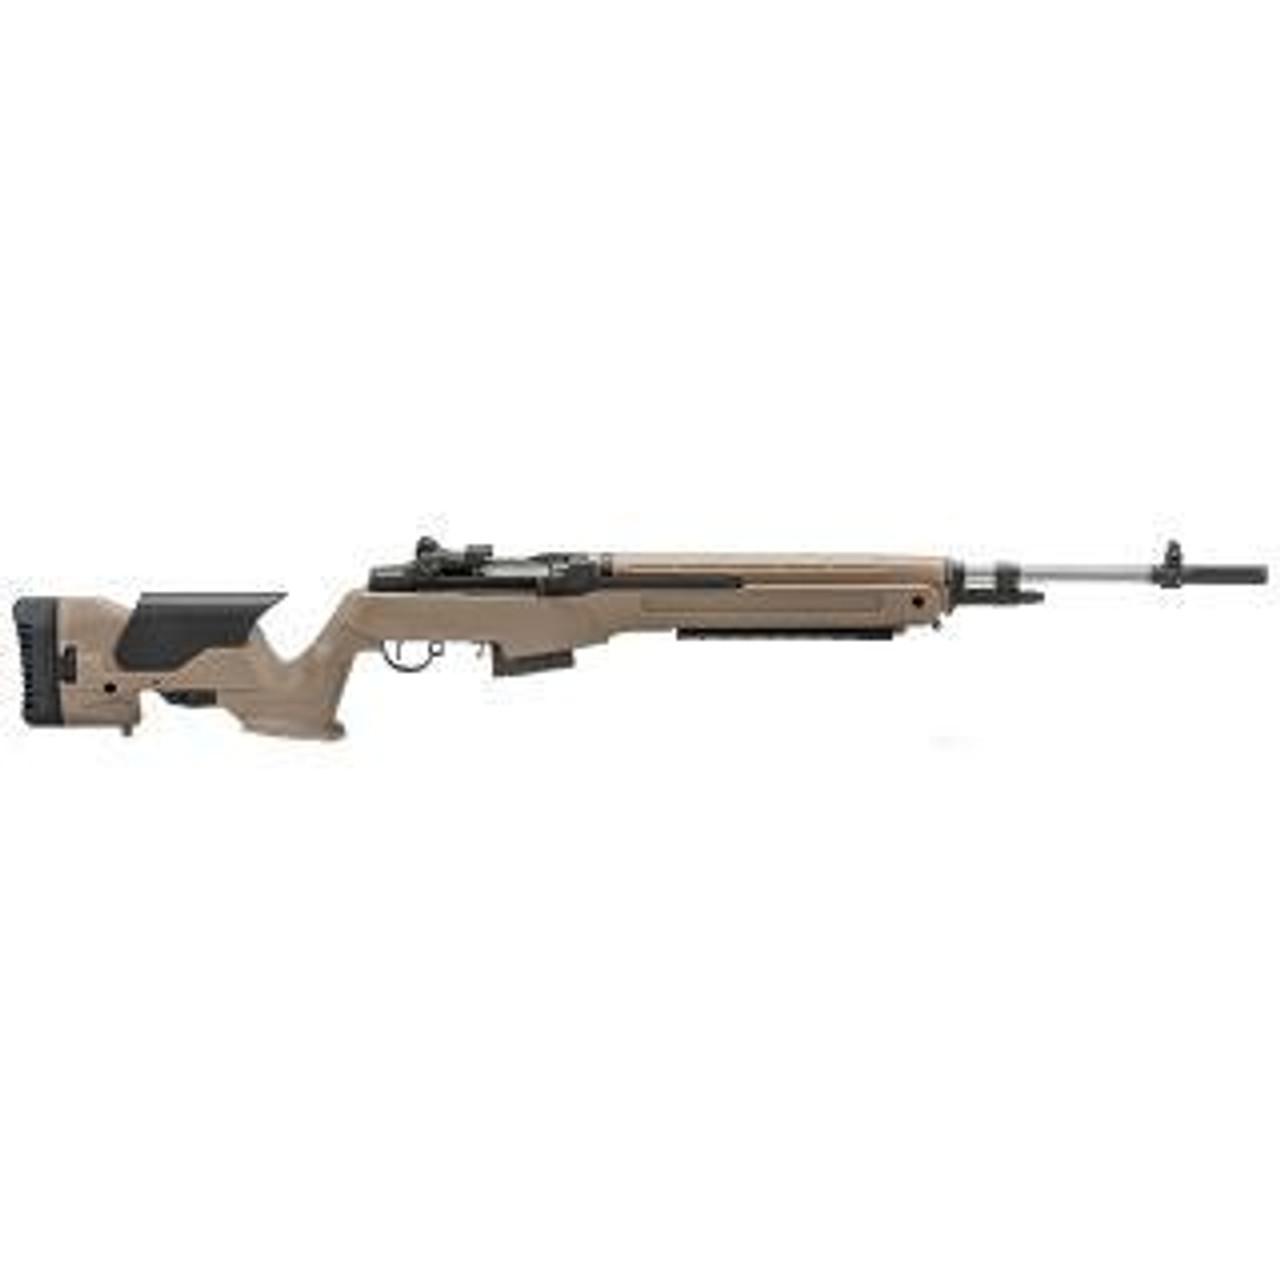 Springfield Armory M1A-Precision Adjustable Rifle Loaded-CALIFORNIA LEGAL-.308